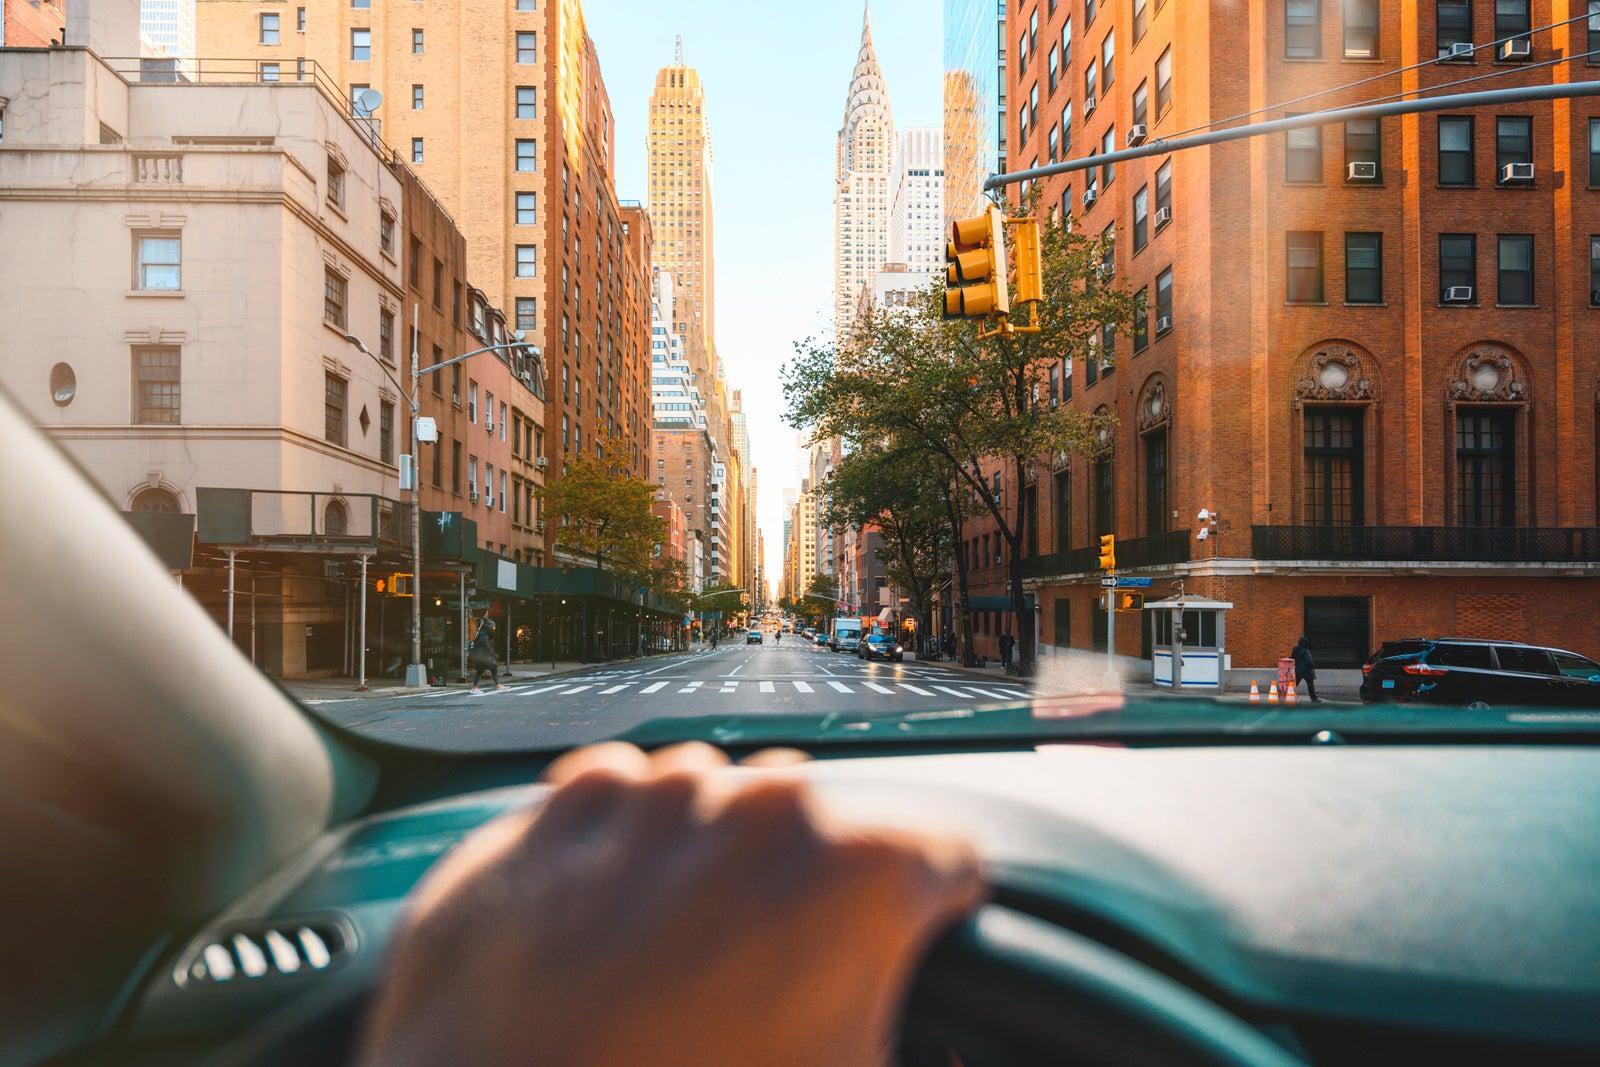 An introduction to New York City's neighborhoods